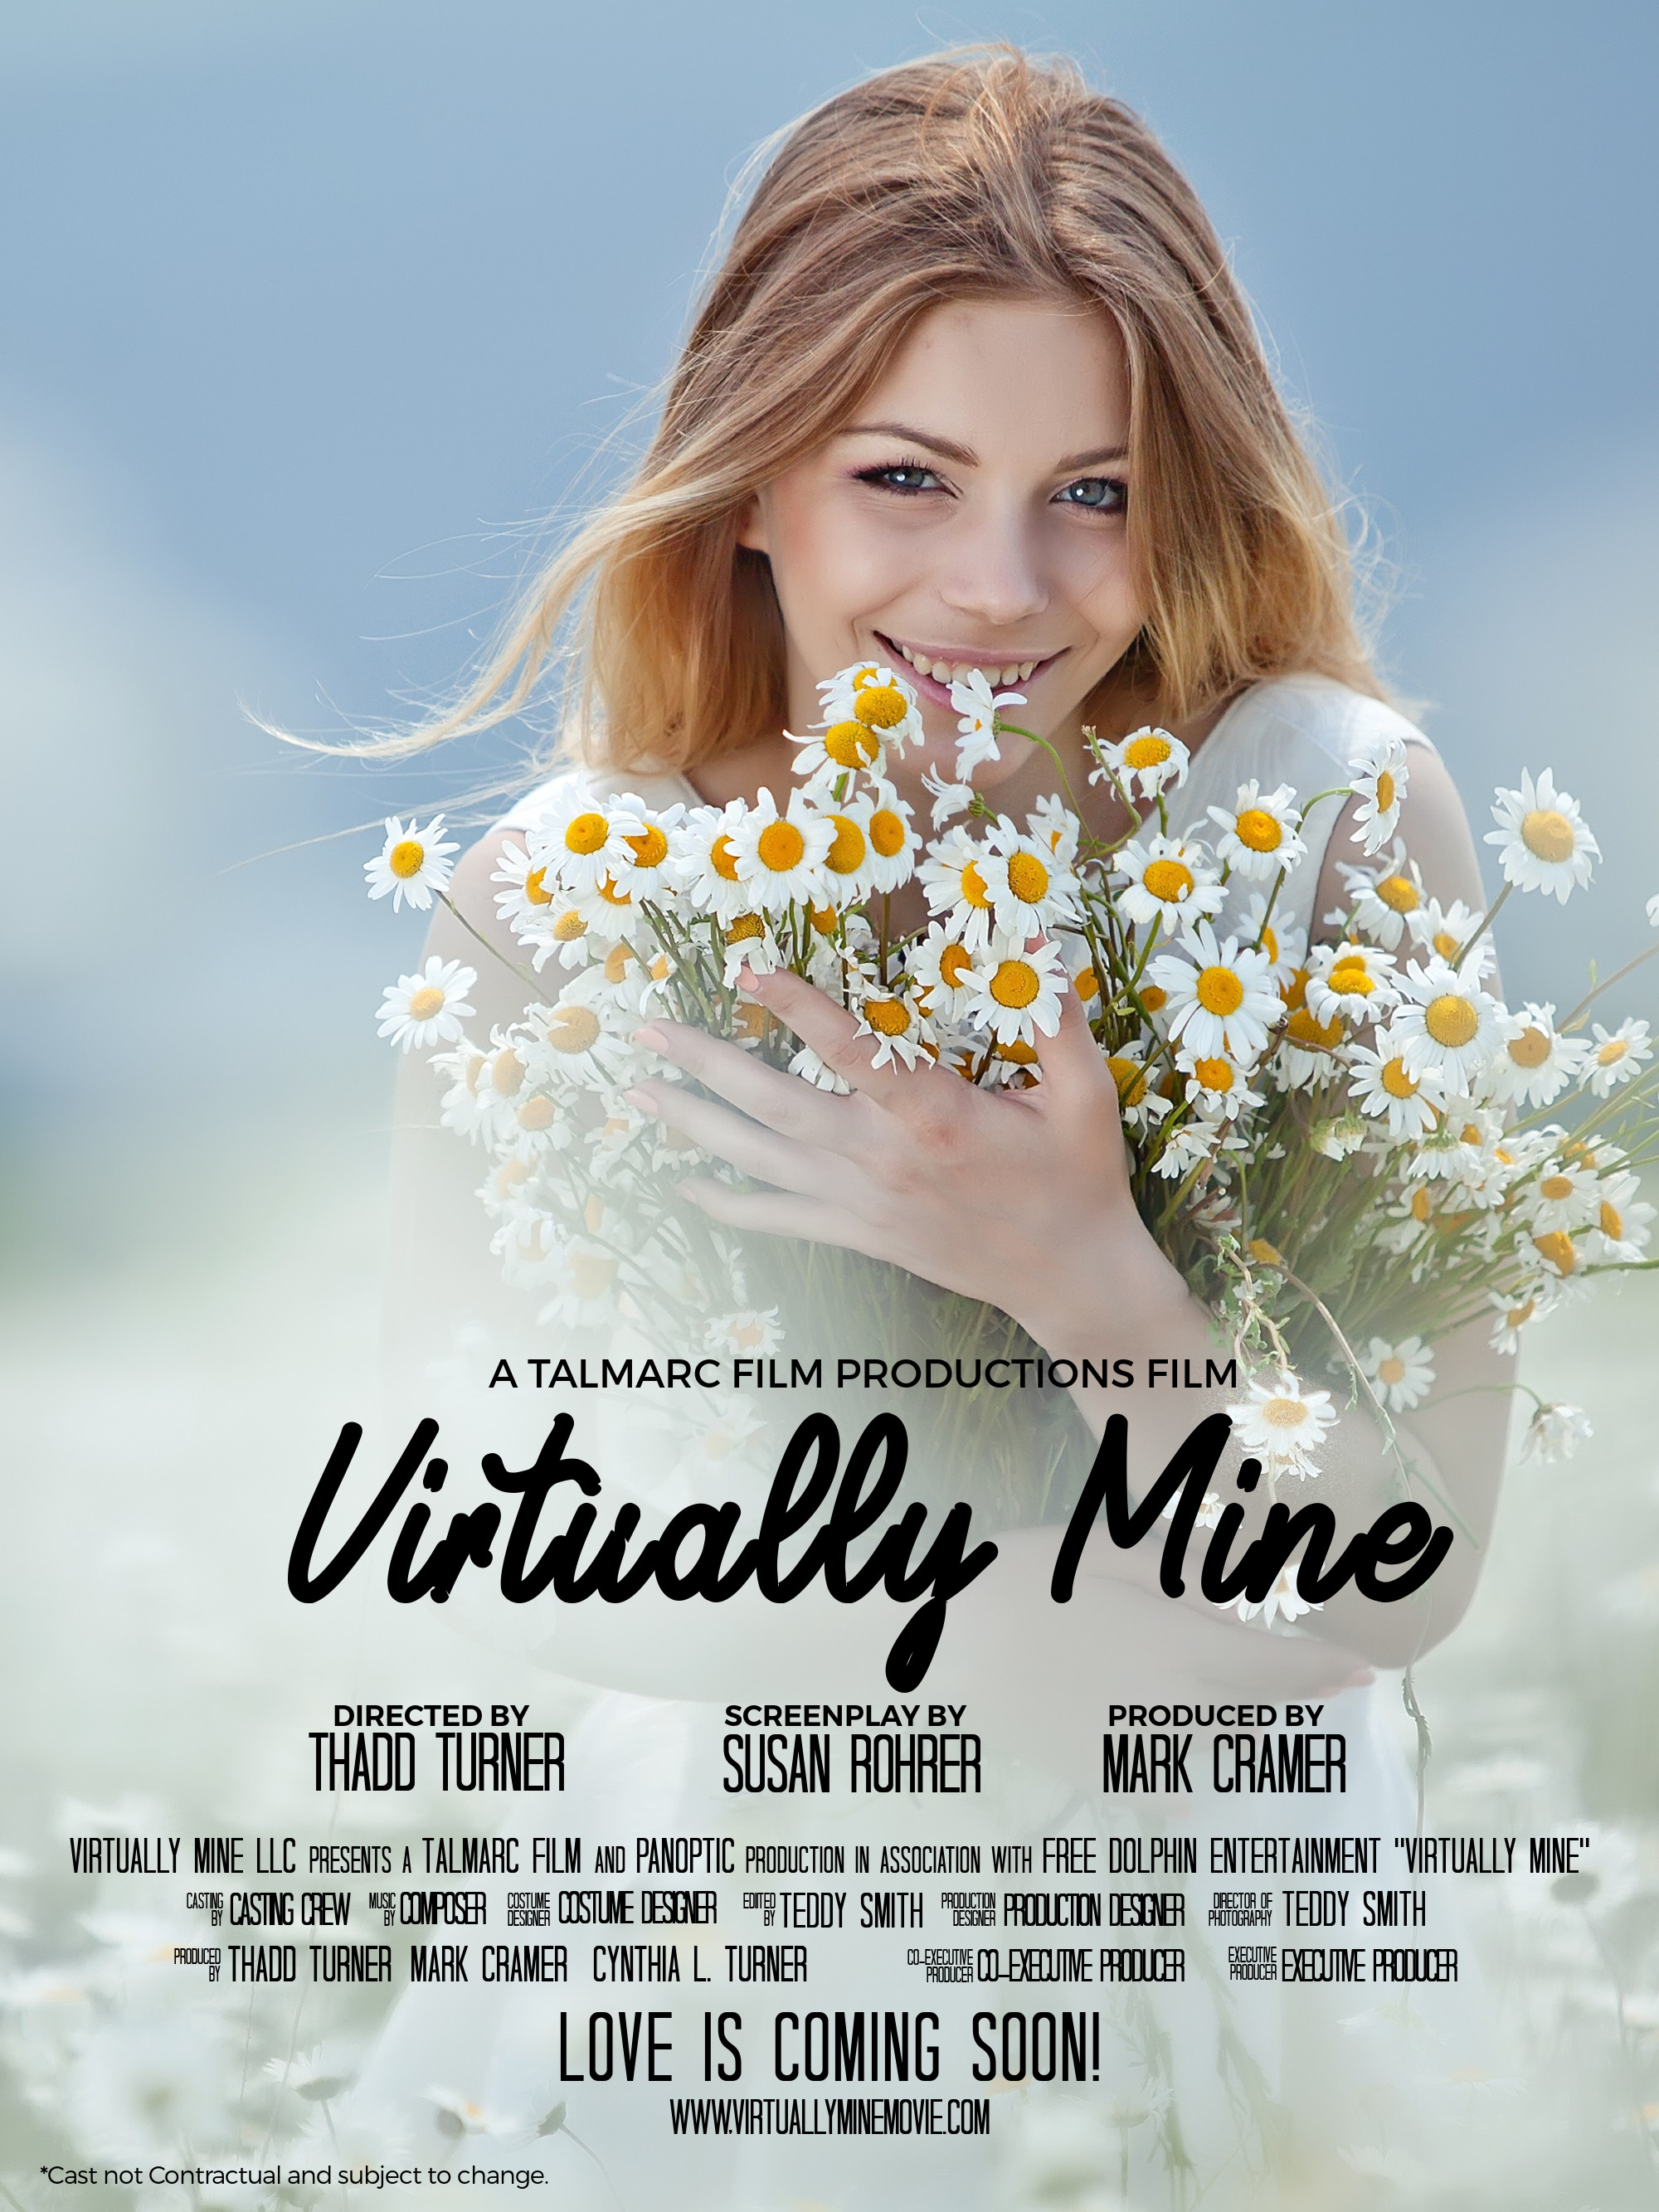 Virtually Mine Movie Poster no actors